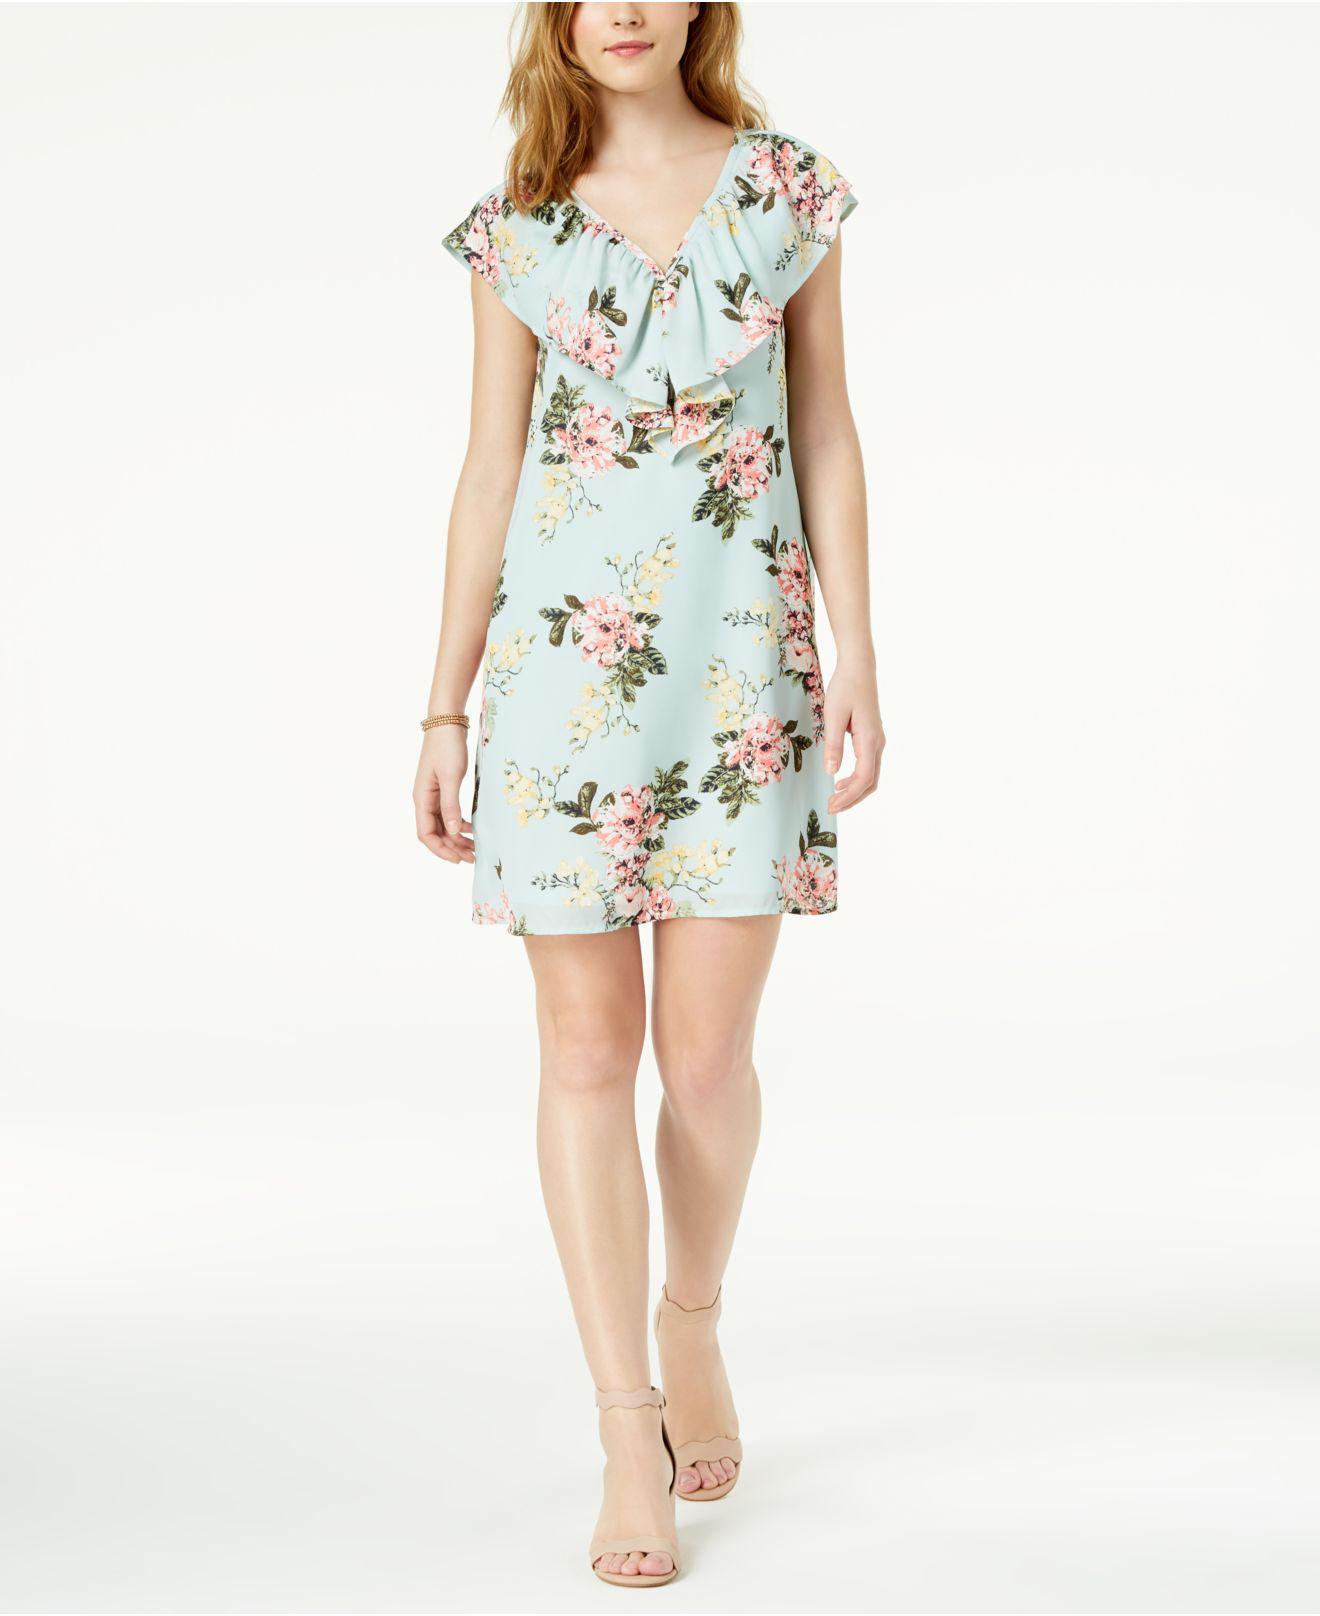 fff151e2c484 Lyst - Maison Jules Printed Flounce Dress